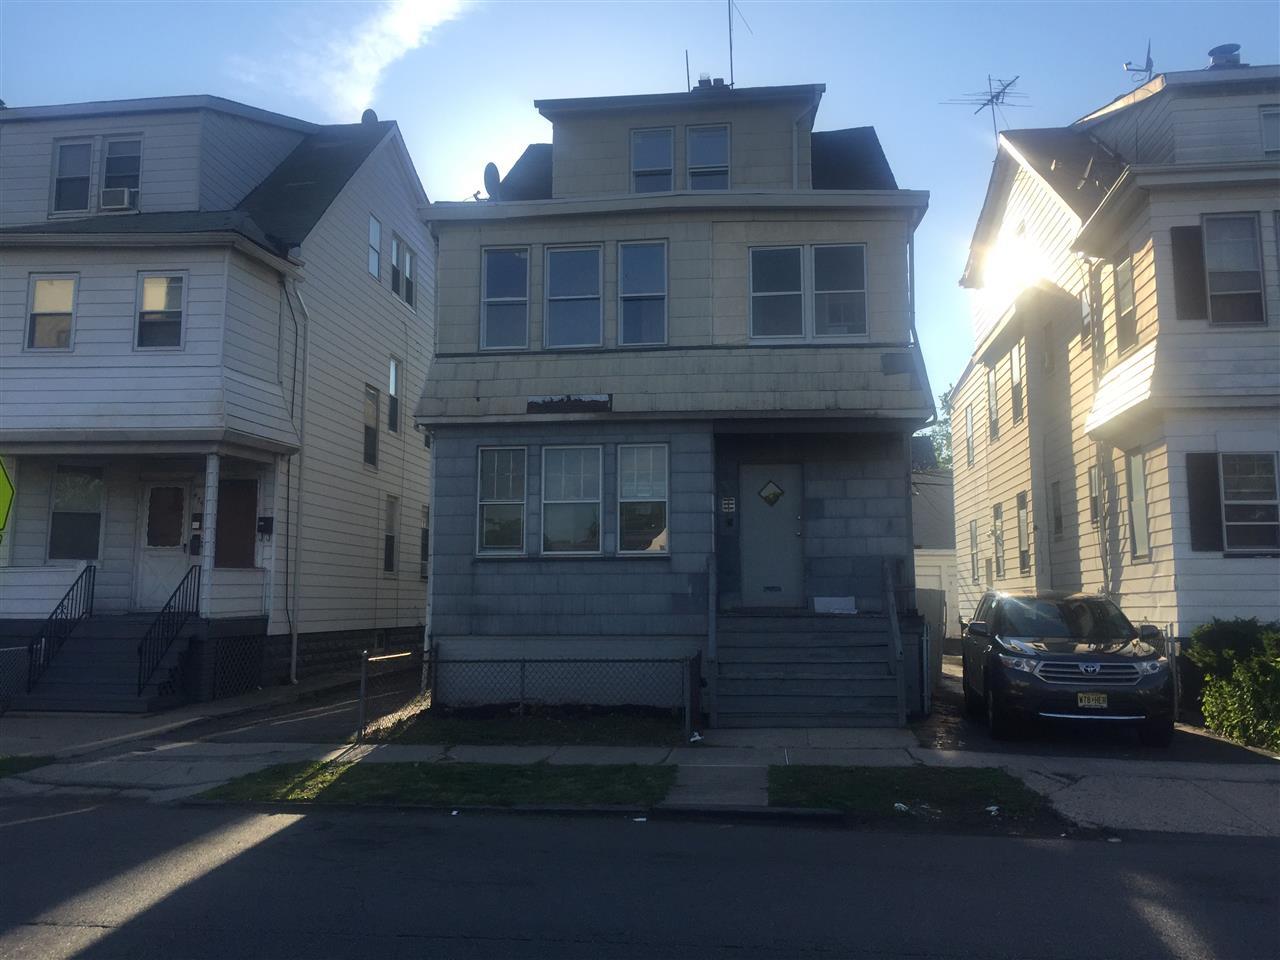 477 SOUTH CLINTON ST, East Orange, NJ 07018